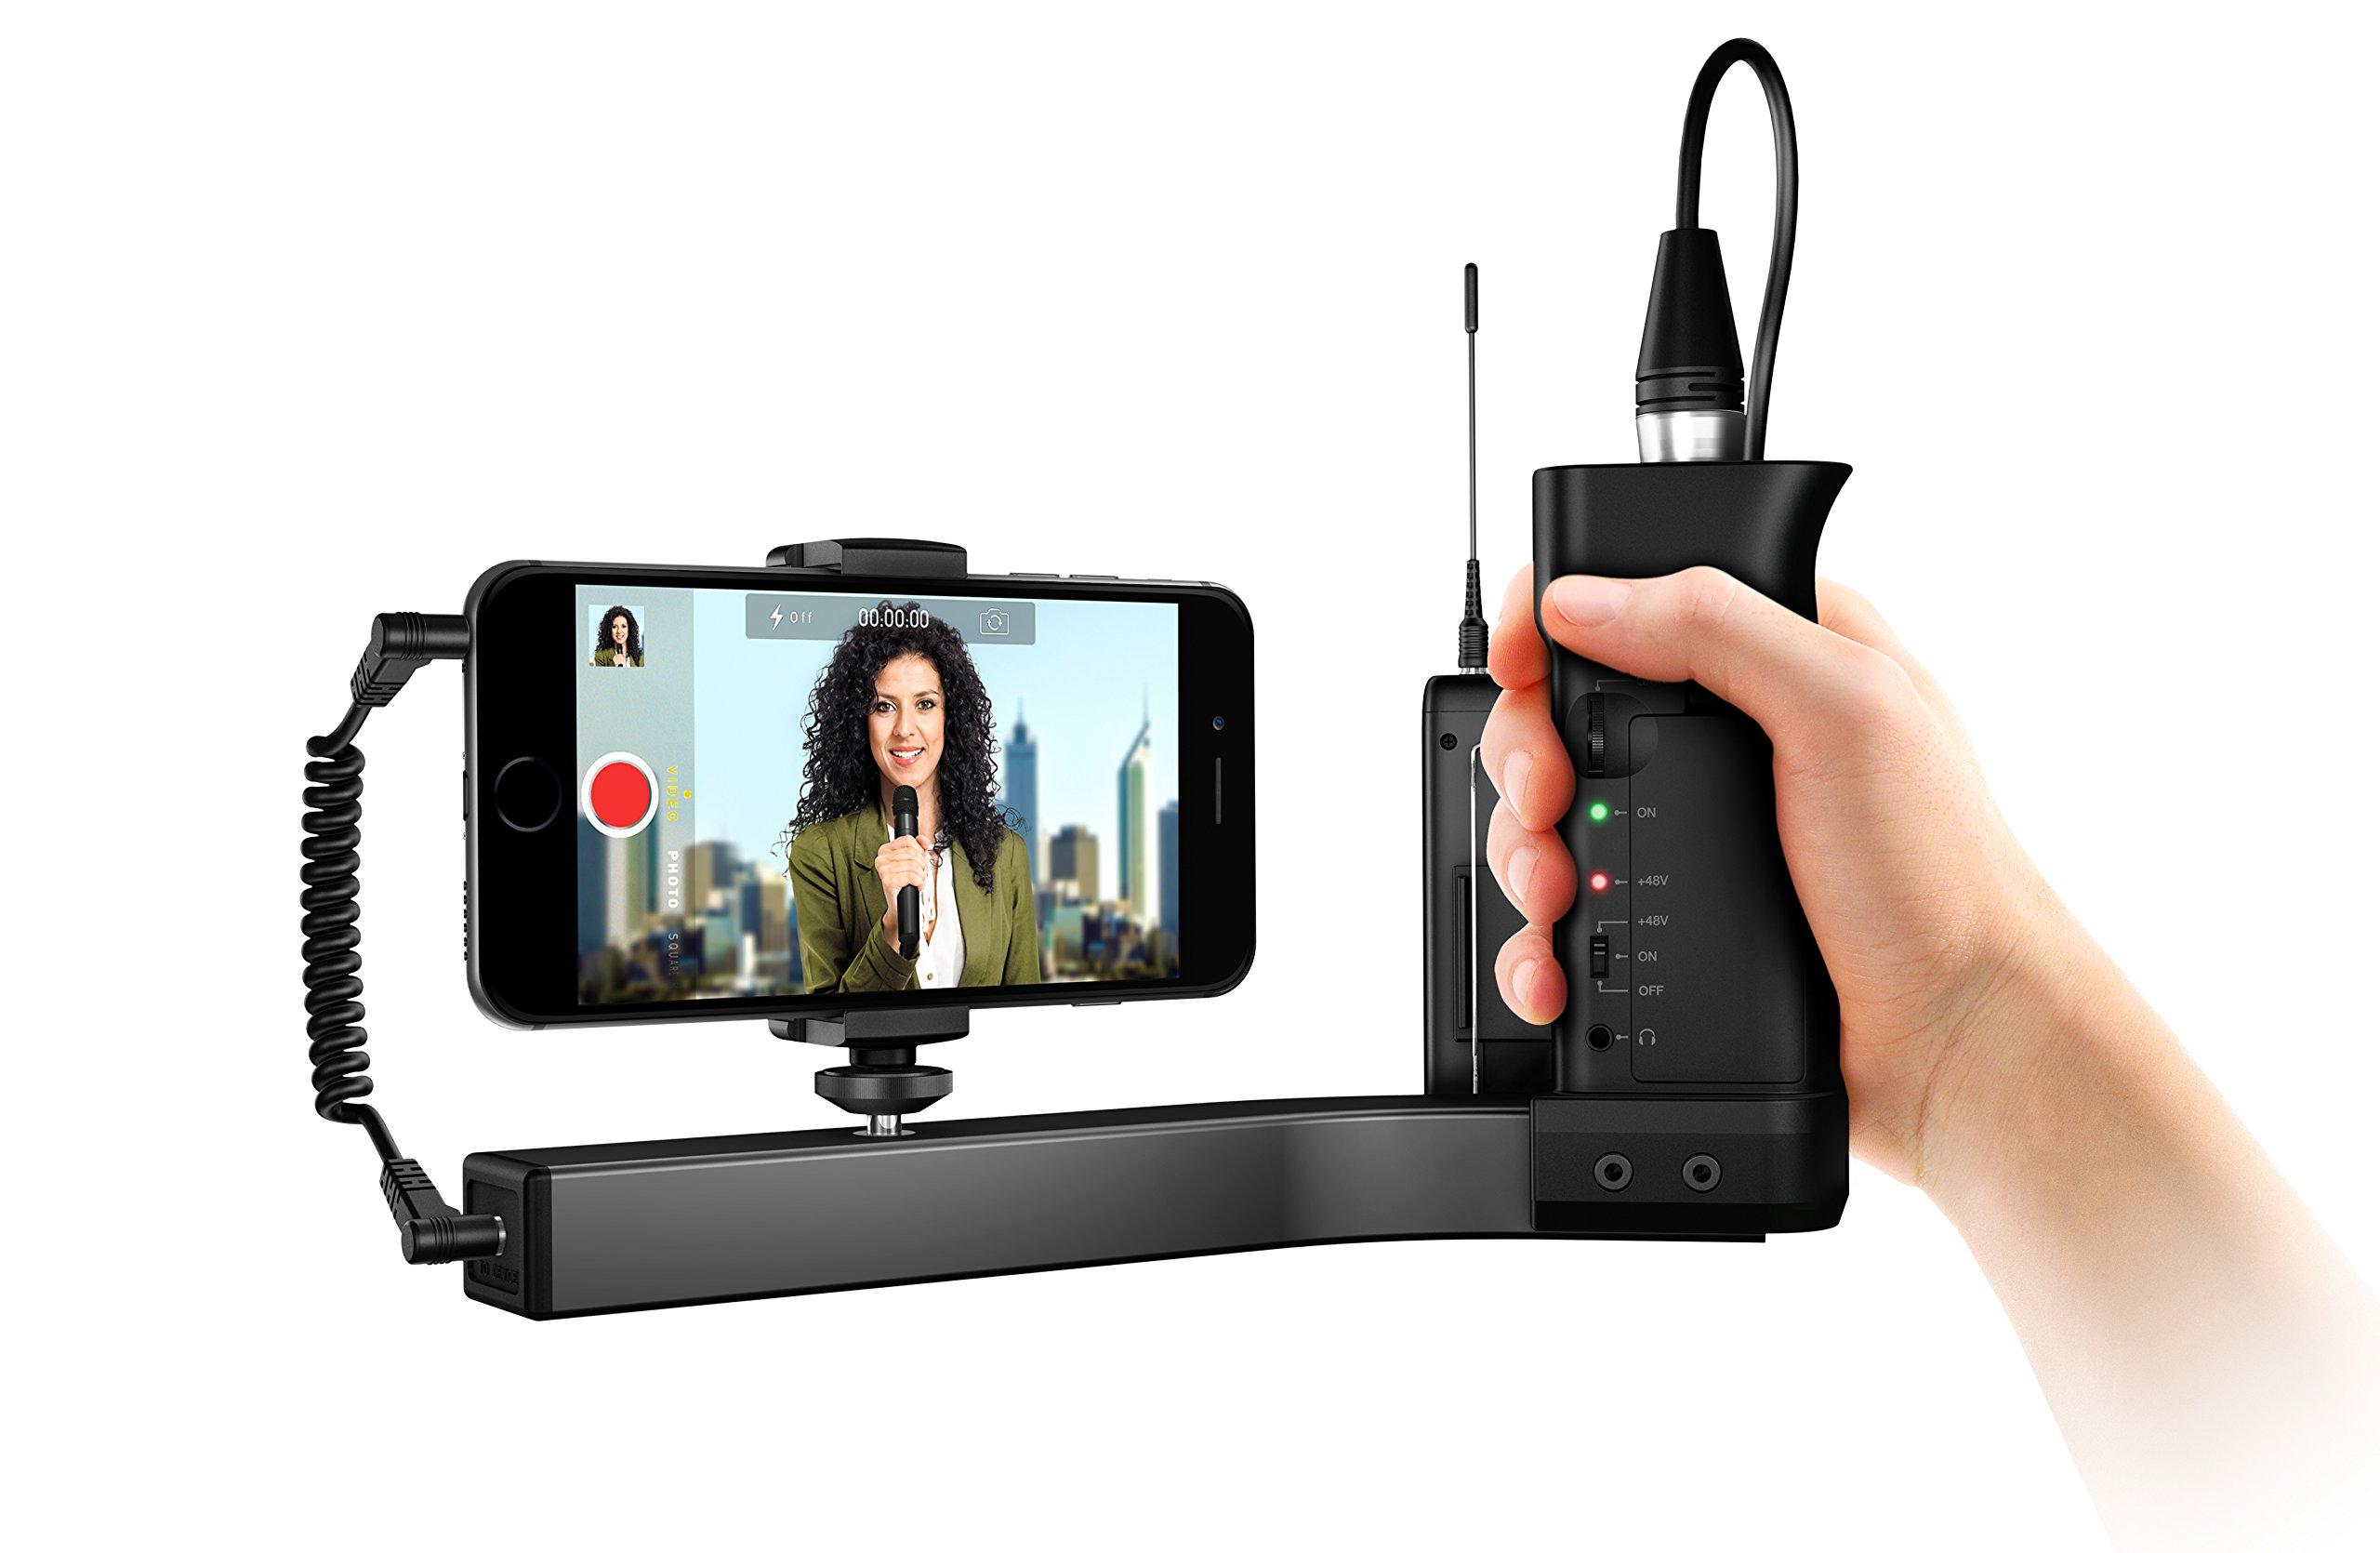 IK Multimedia iKlip A/V Broadcast Audio/Video Mount & Pre-Amp for Smartphones by IK Multimedia